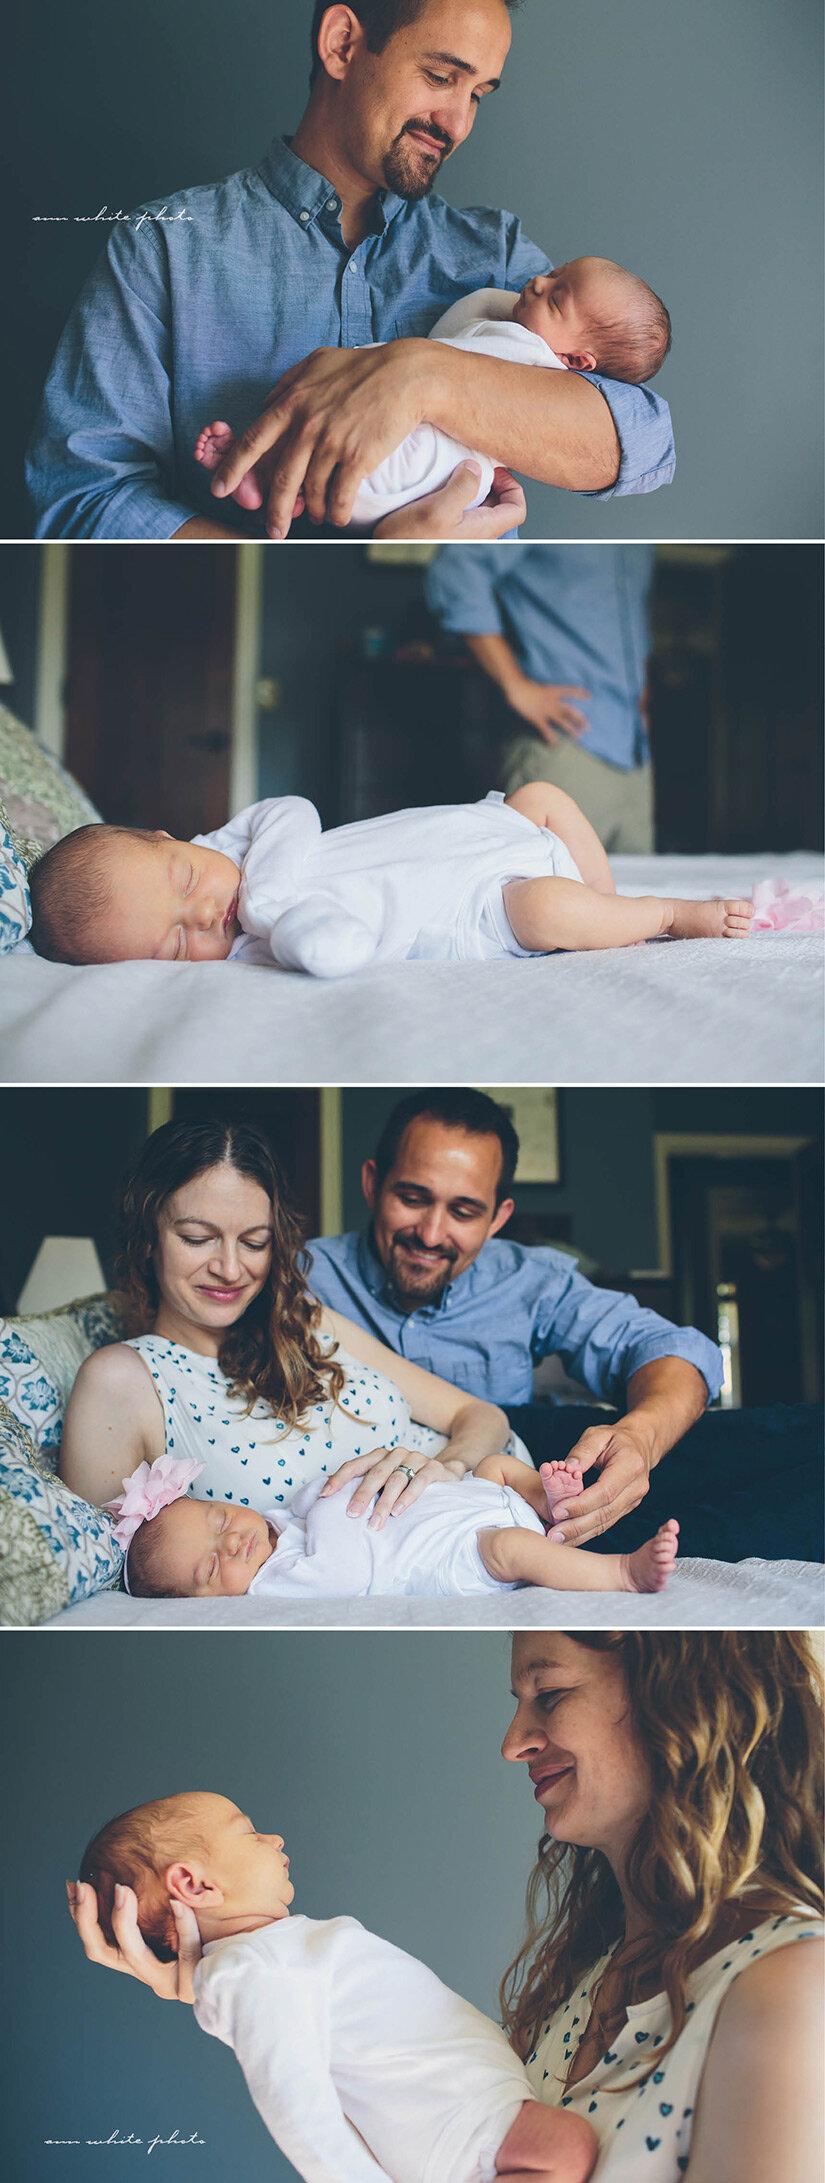 2016_Dyllan_newborn_blog5.jpg